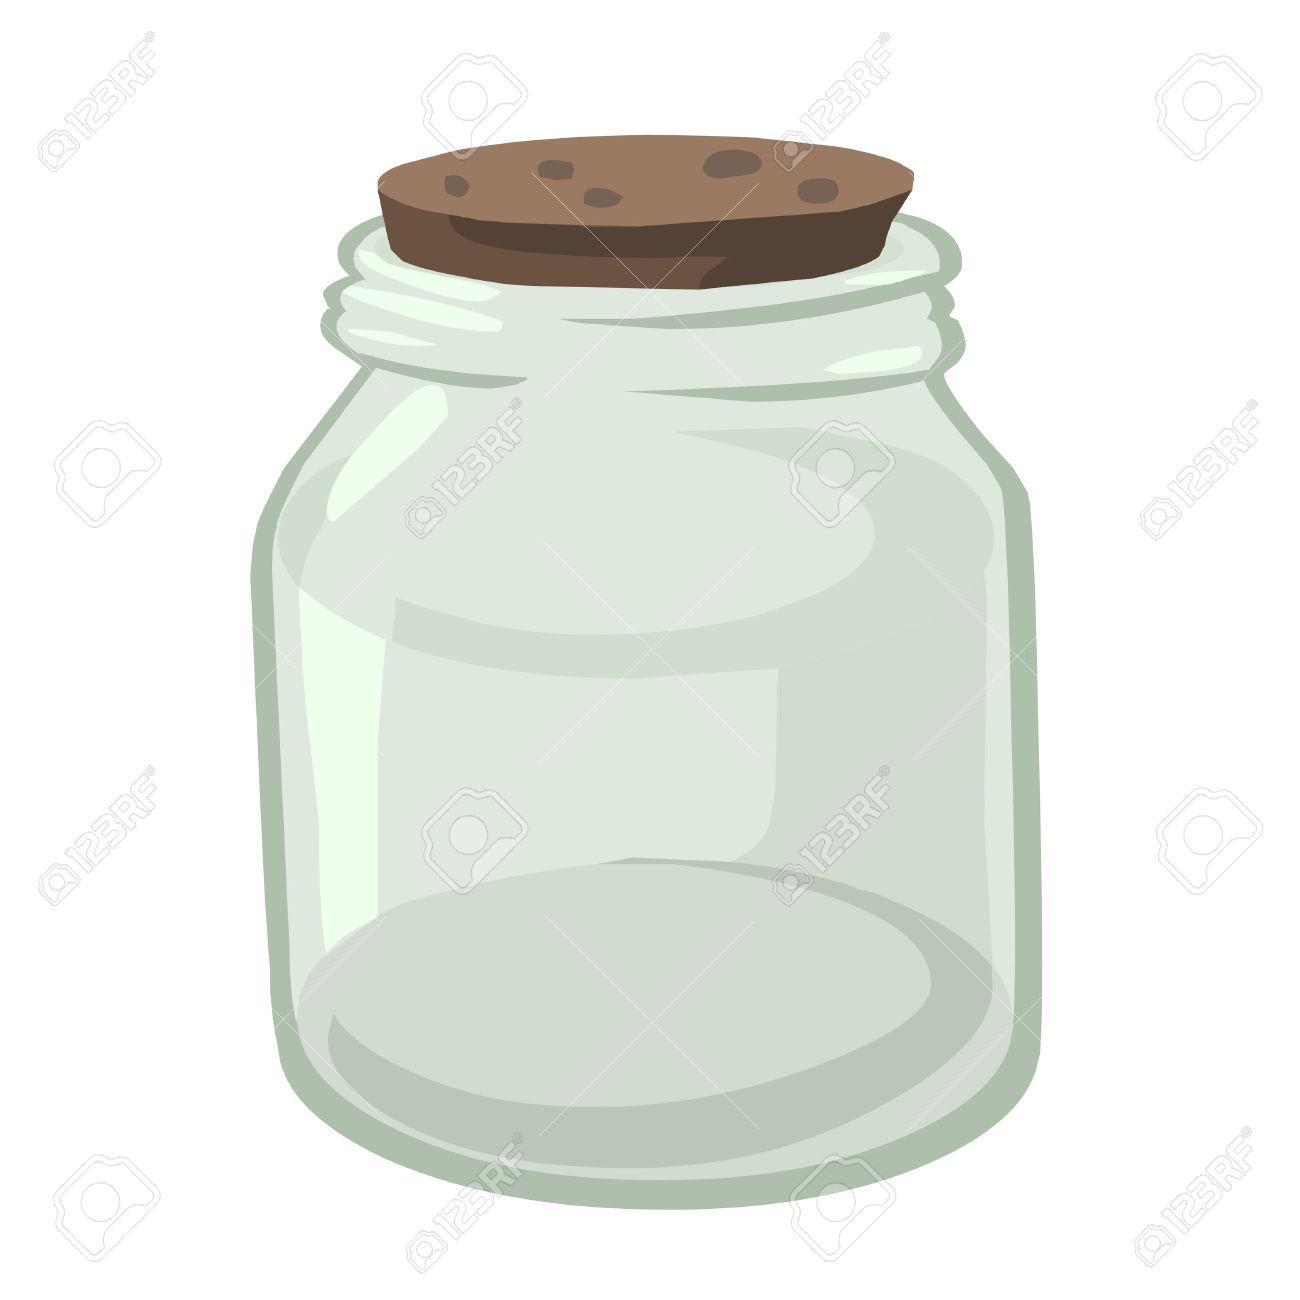 Glass jar clipart.